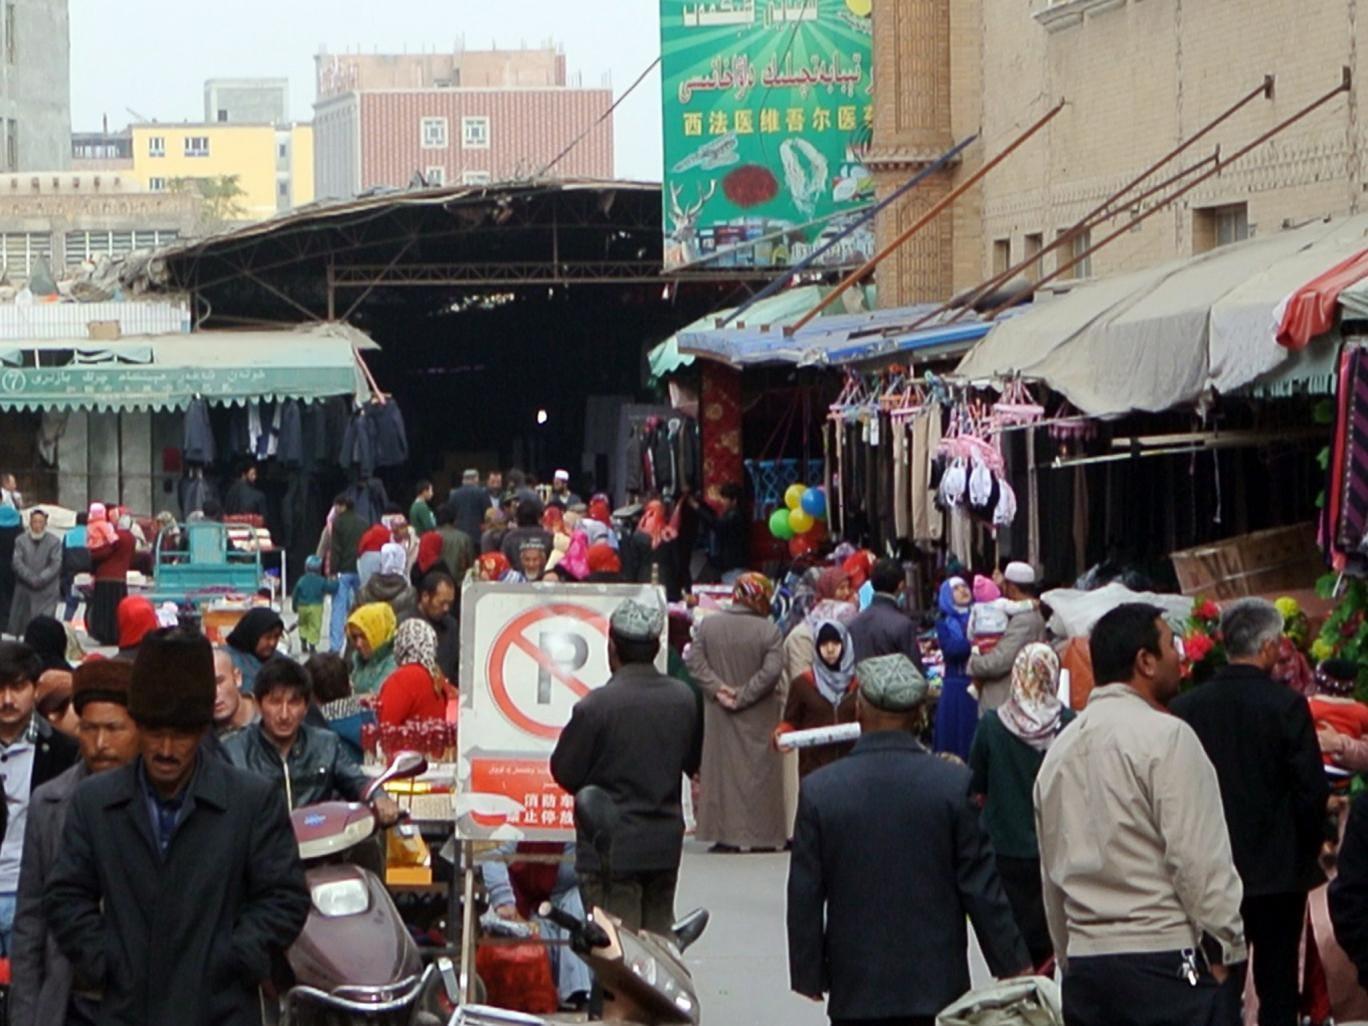 A crowd of mainly Uighur shop at a bazaar in China's Xinjiang region